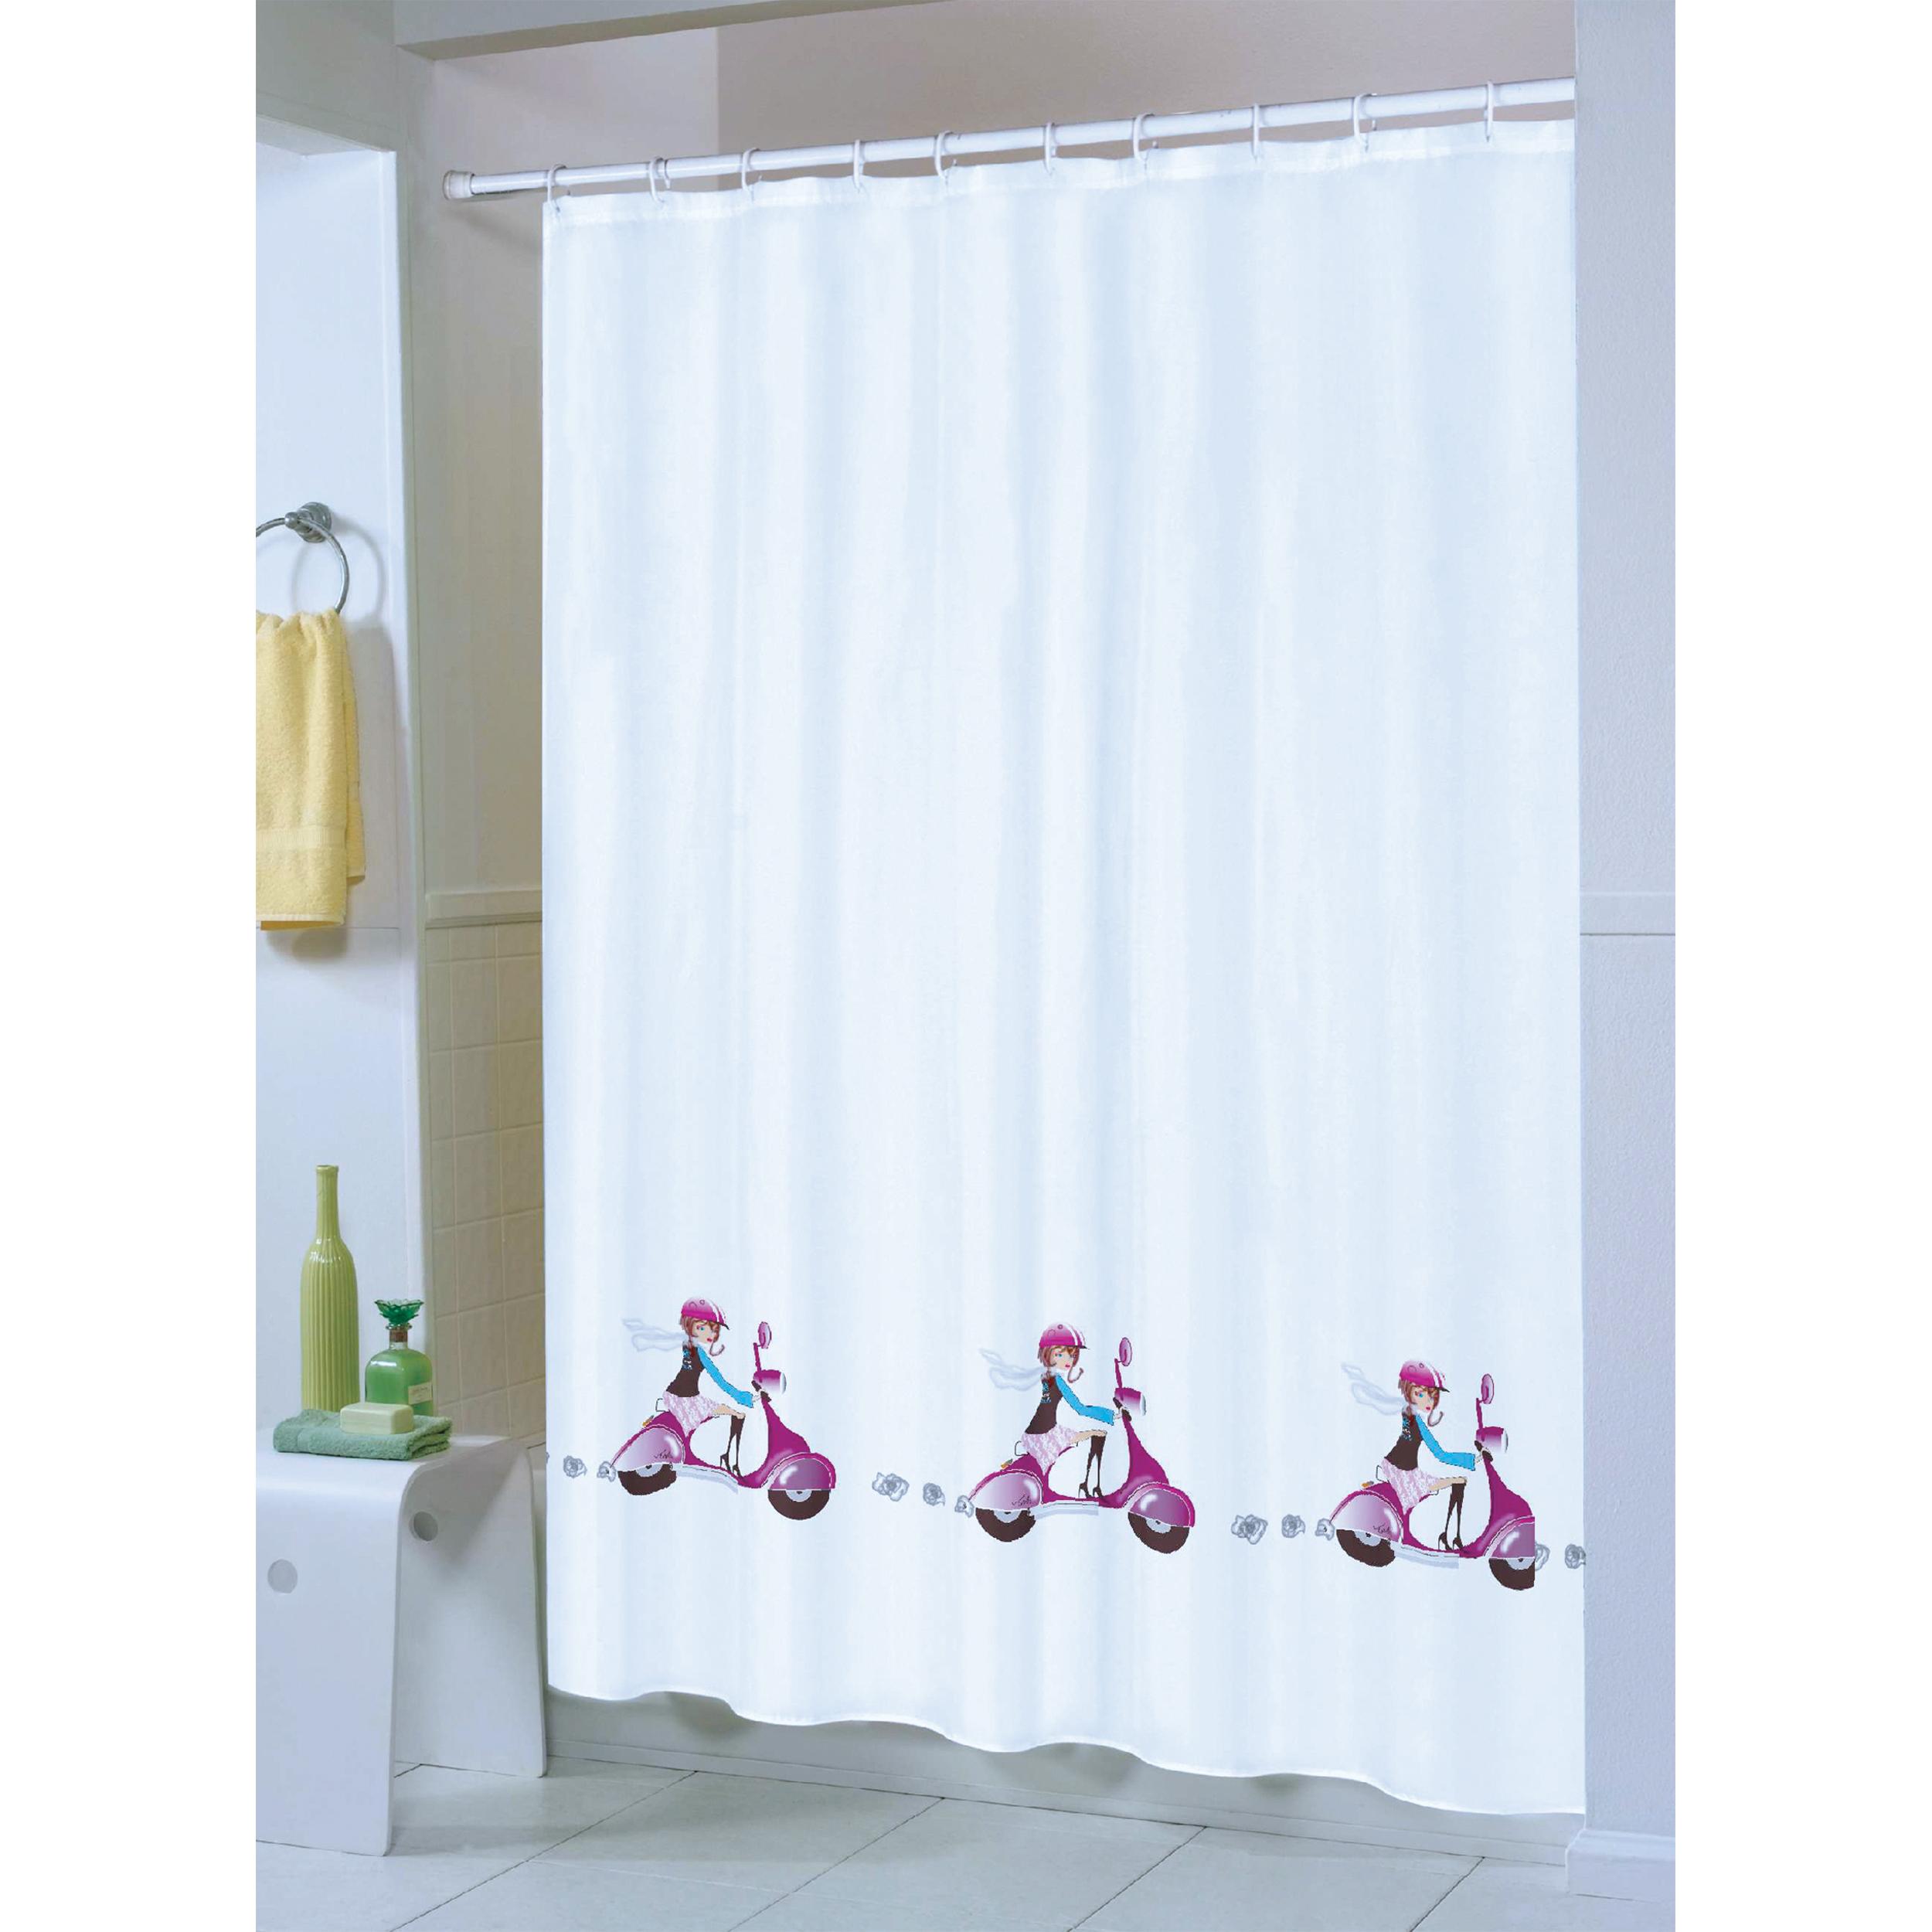 MSV Duschvorhang 180x200cm Anti Schimmel Textil Badewannenvorhang Wannenvorhang Jane